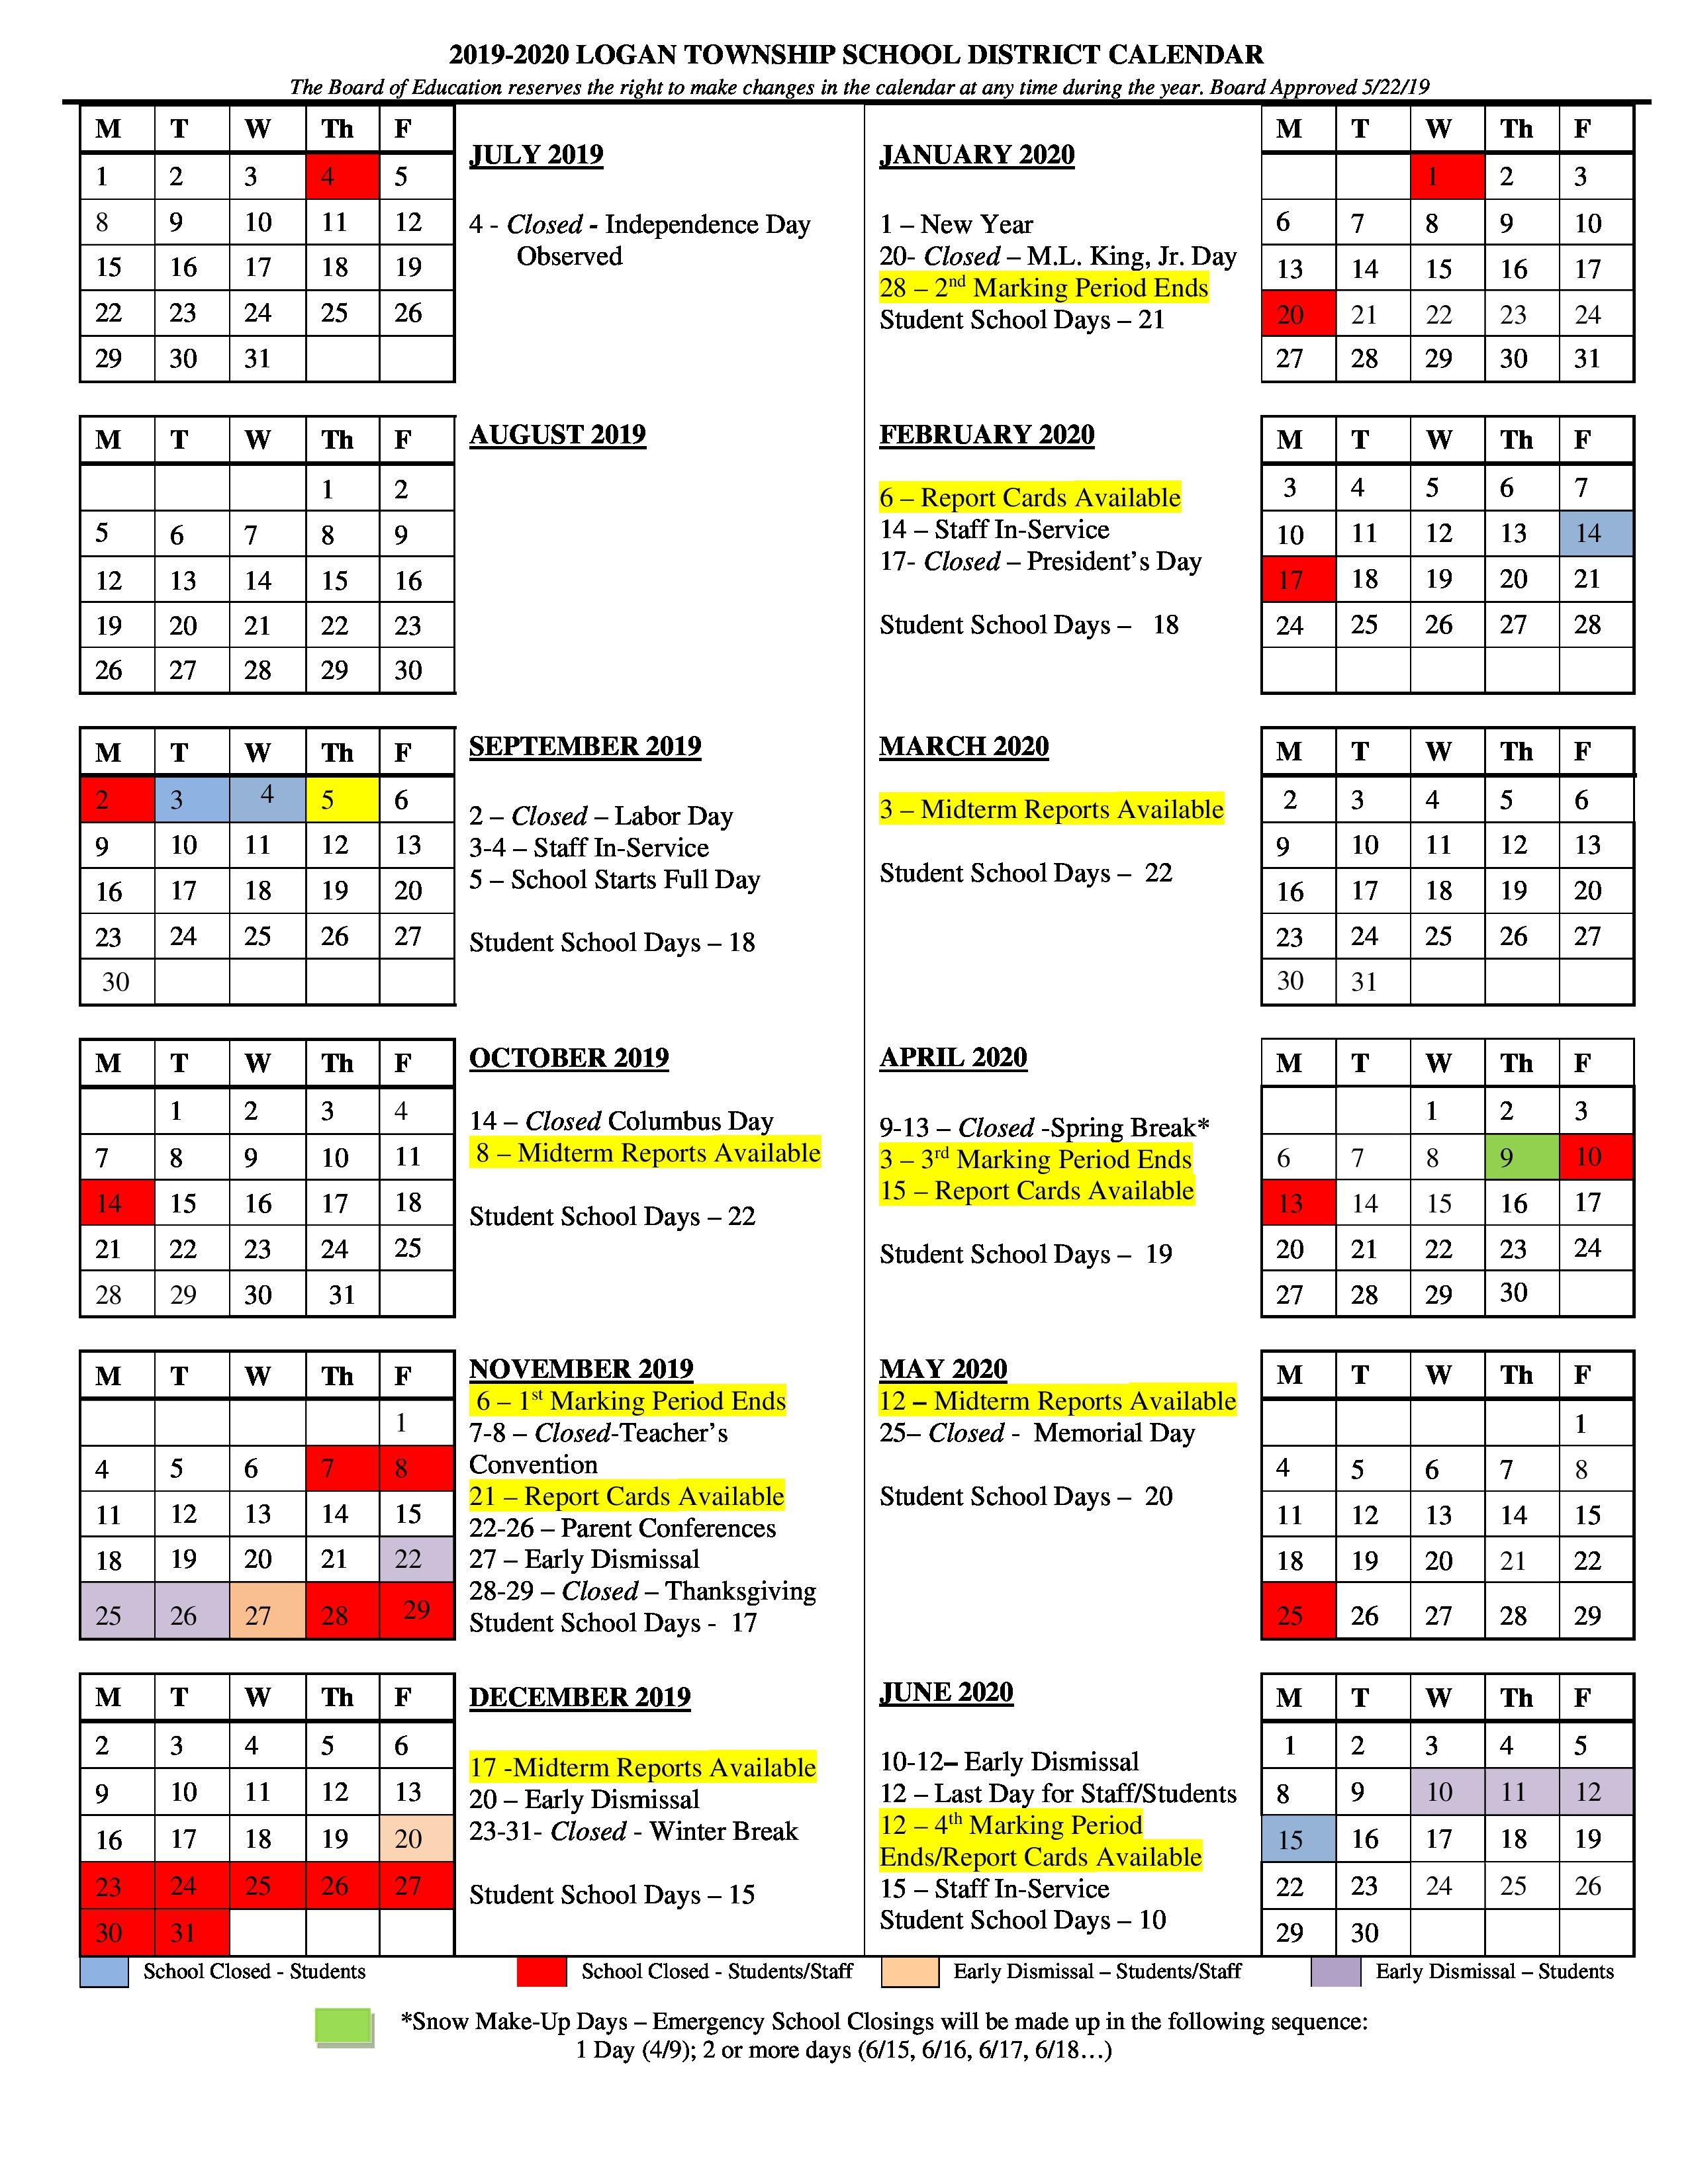 Logan Township Schools District Within Manheim Township School District Calendar